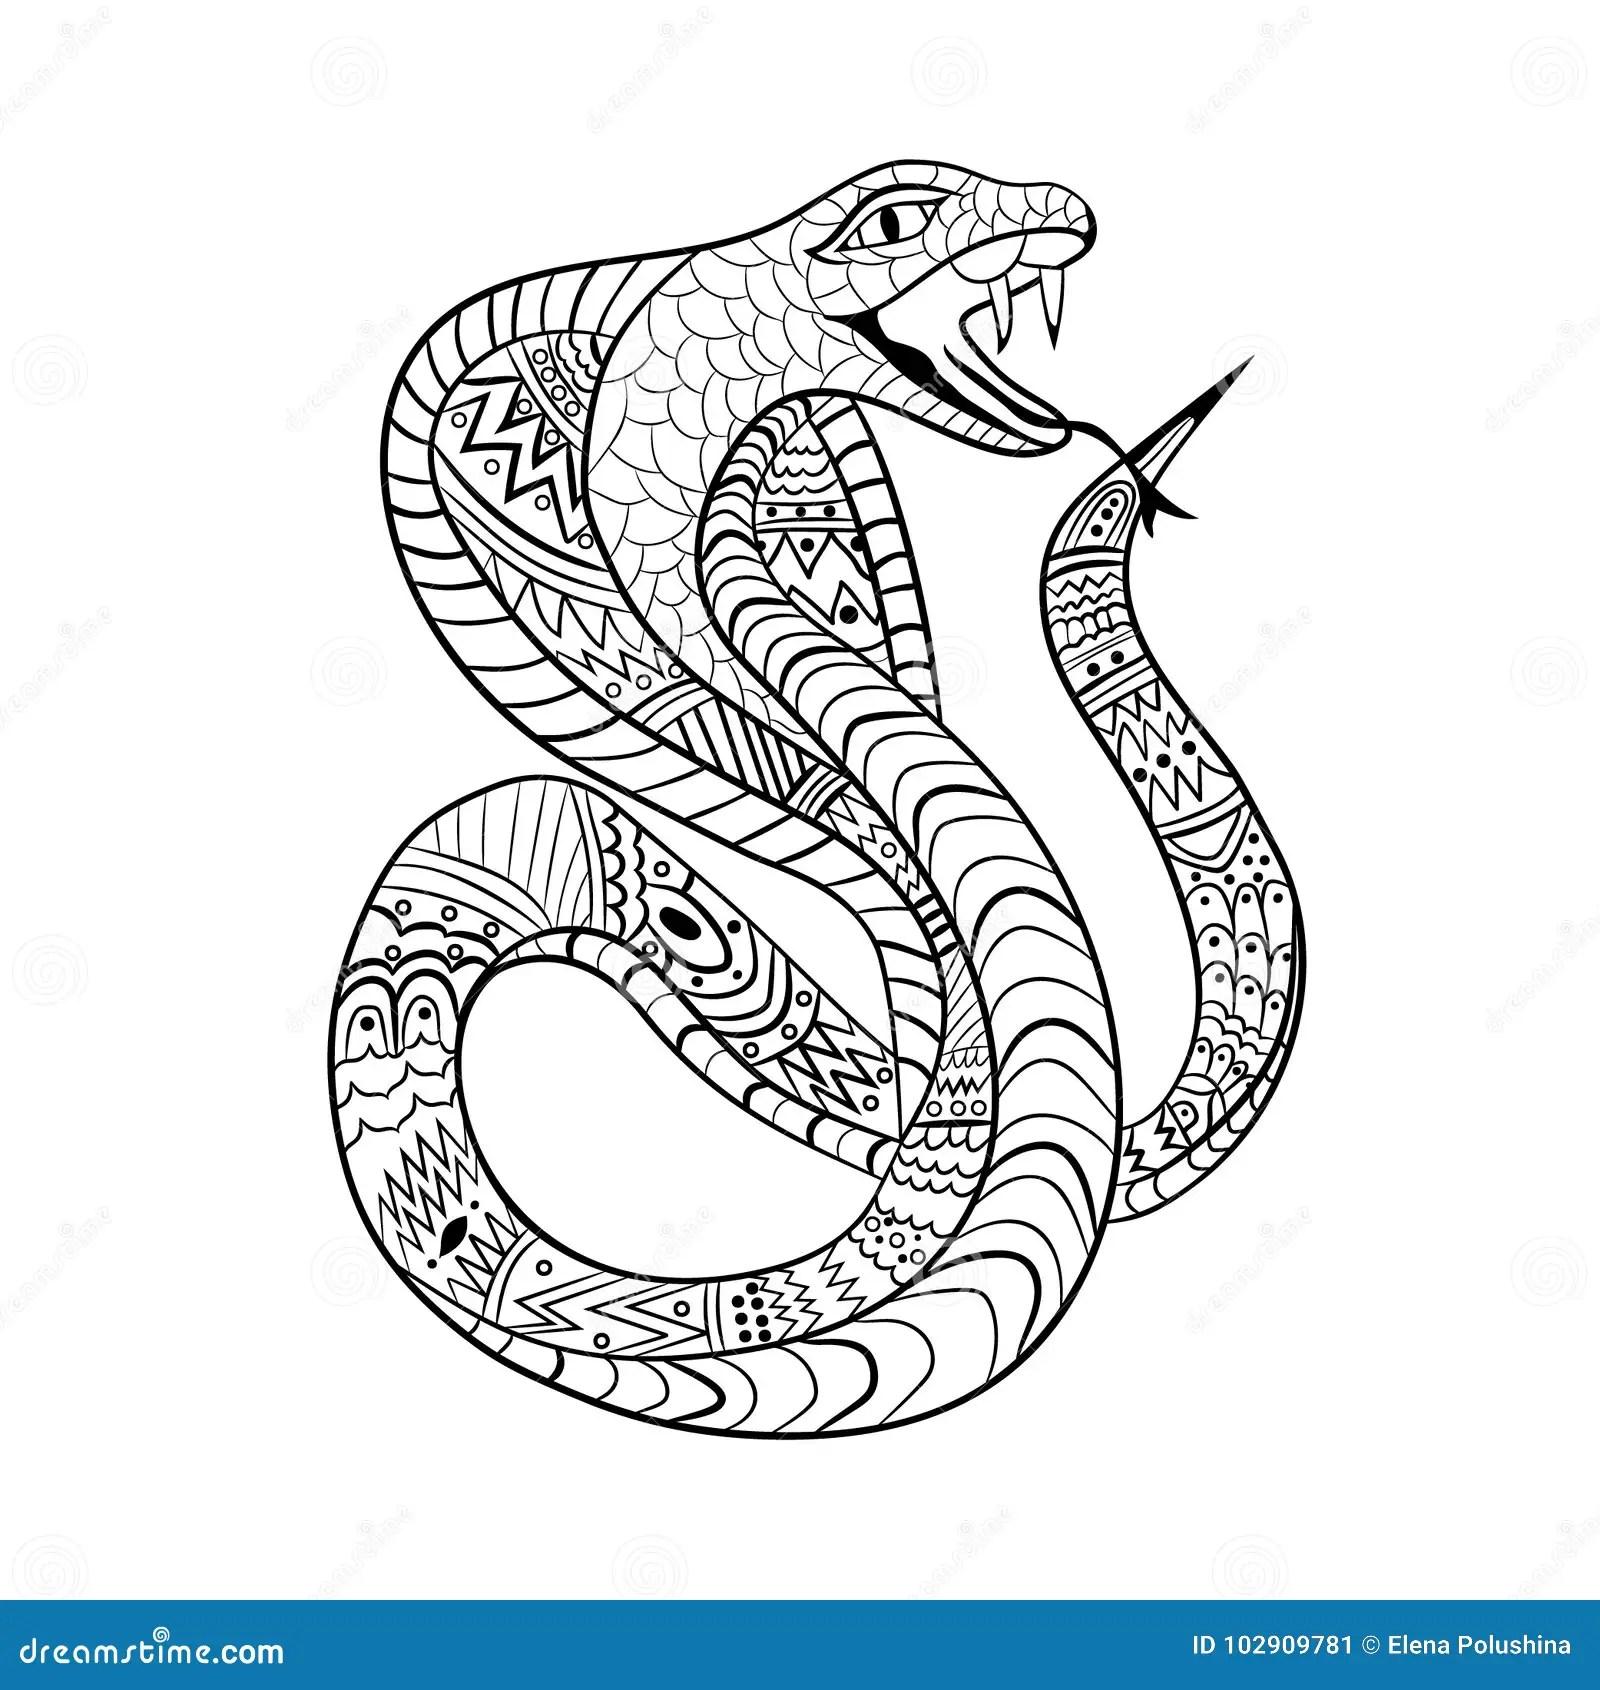 Cobra Zentangle. Ethnic Ornament Of The Snake. For Tattoo